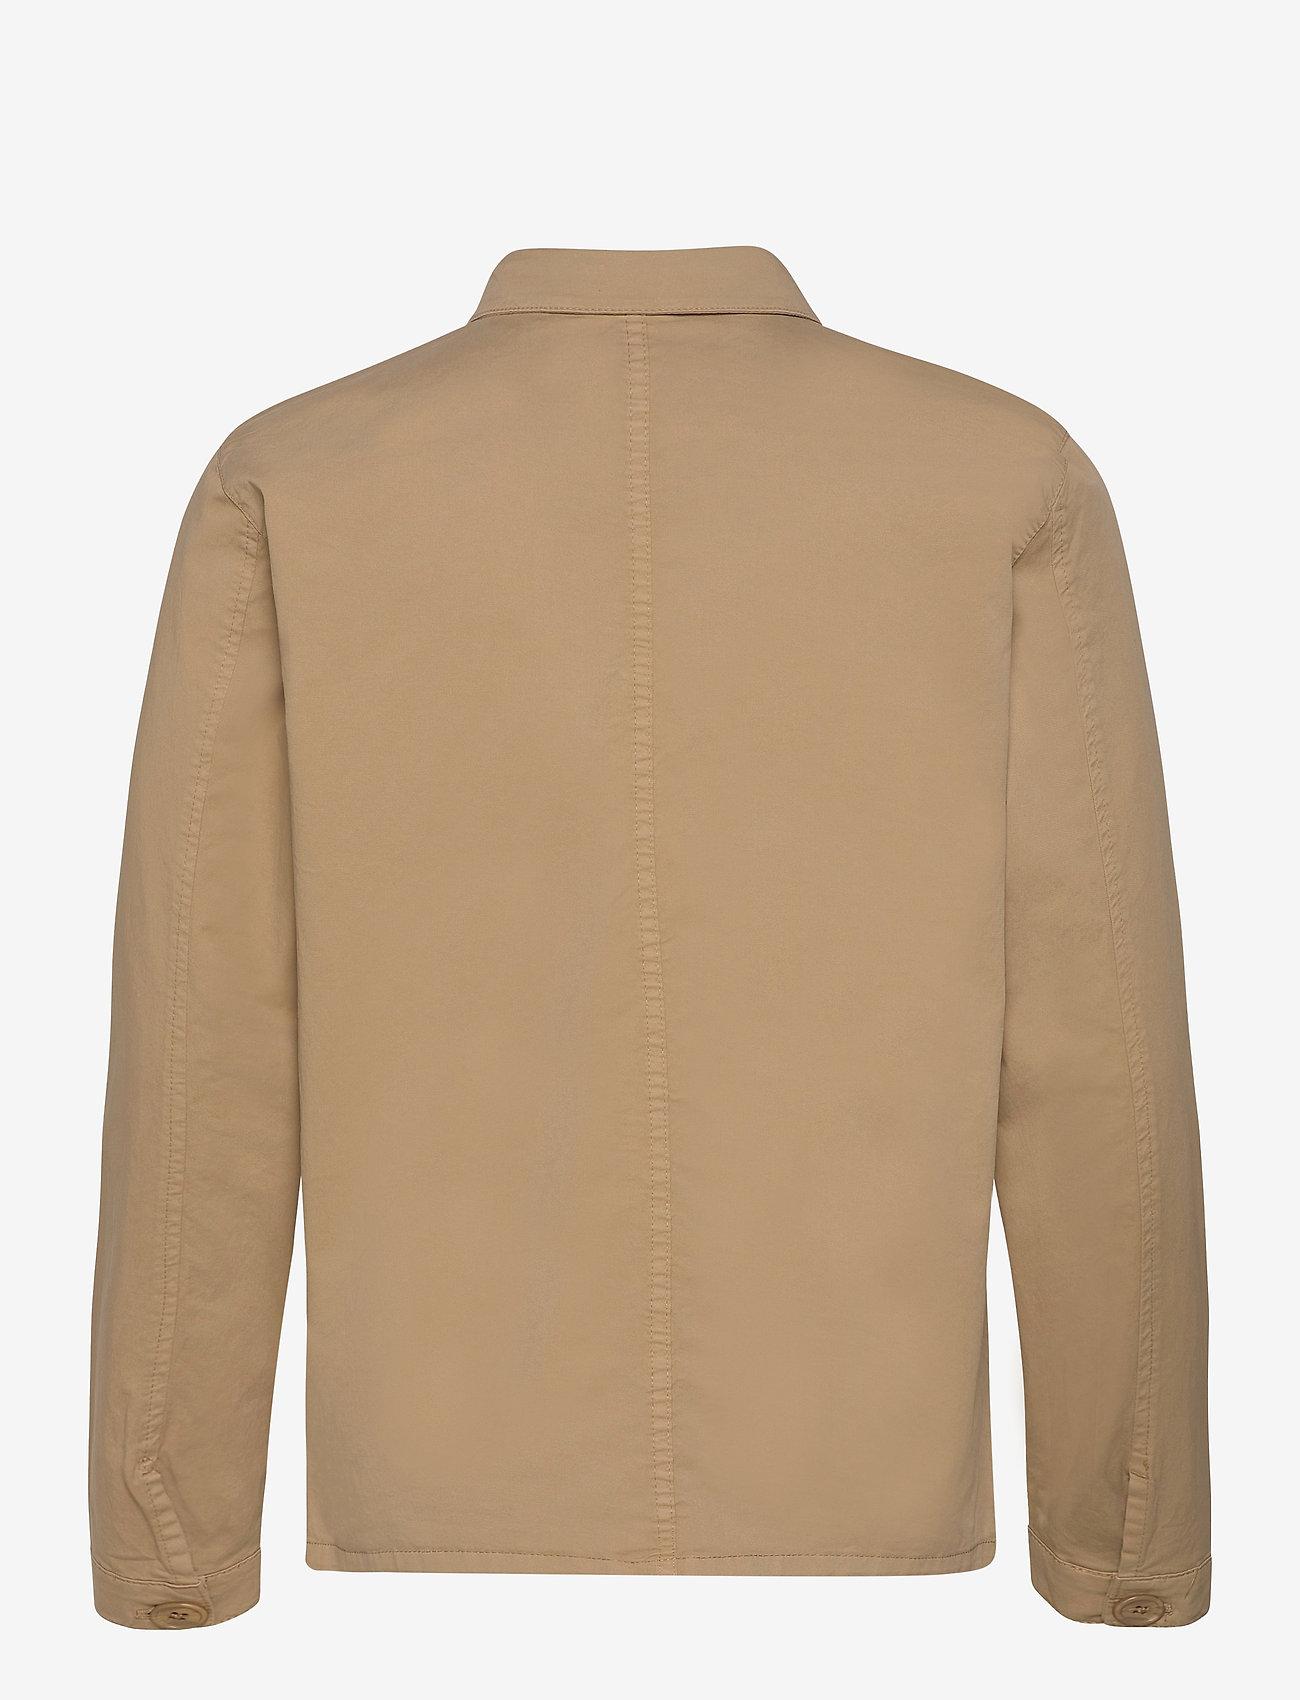 By Garment Makers - The Organic Workwear Jacket - vêtements - khaki - 2